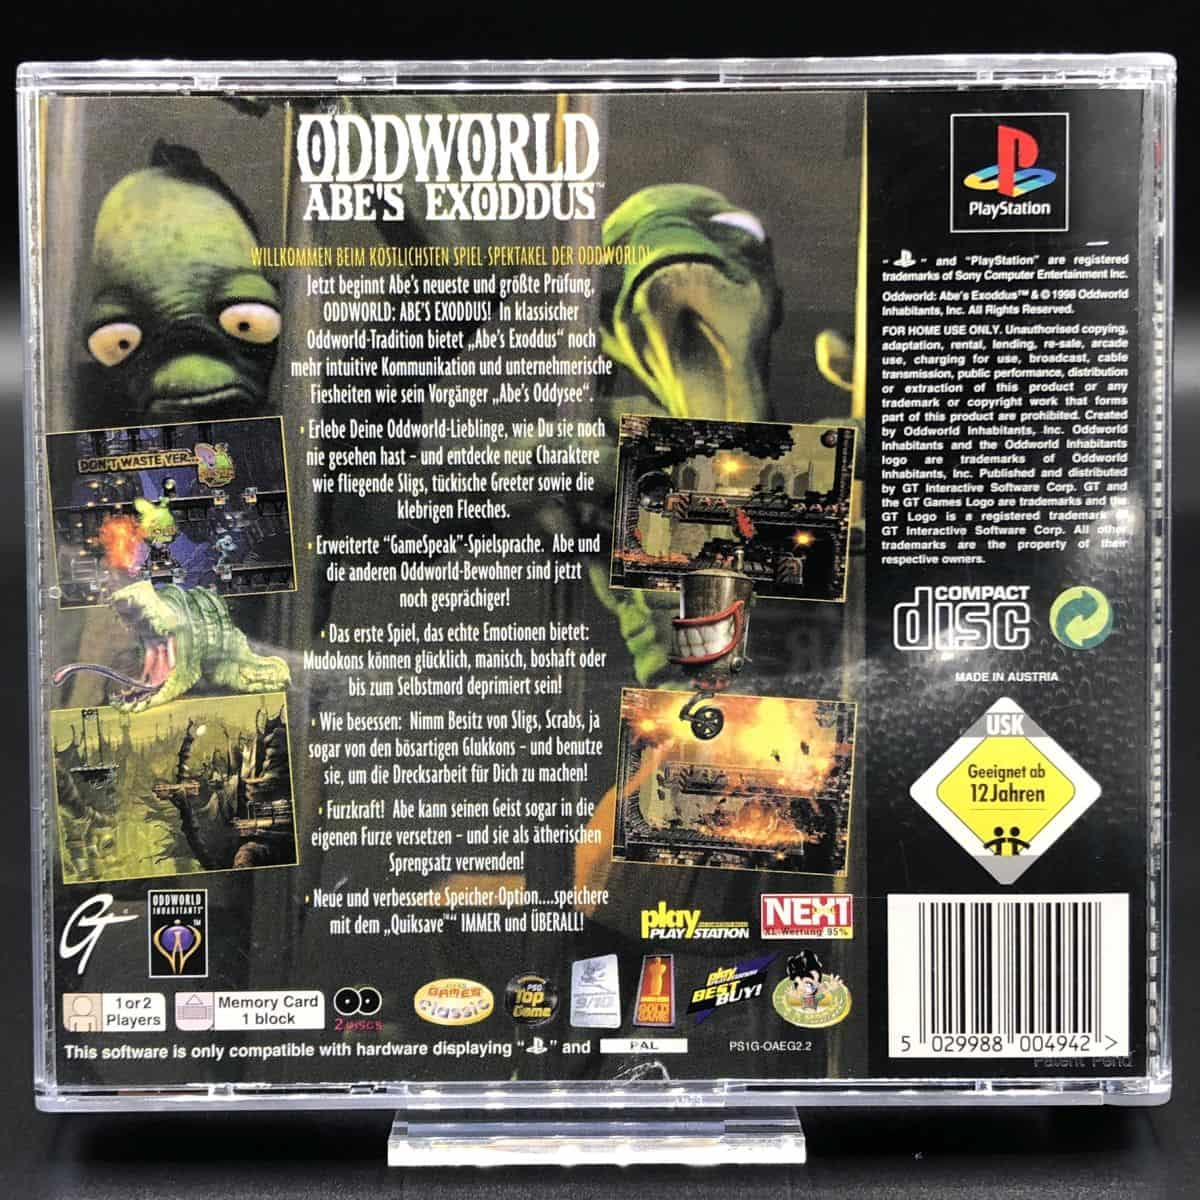 PS1 Oddworld: Abe's Exoddus (Komplett) (Sehr gut) Sony PlayStation 1